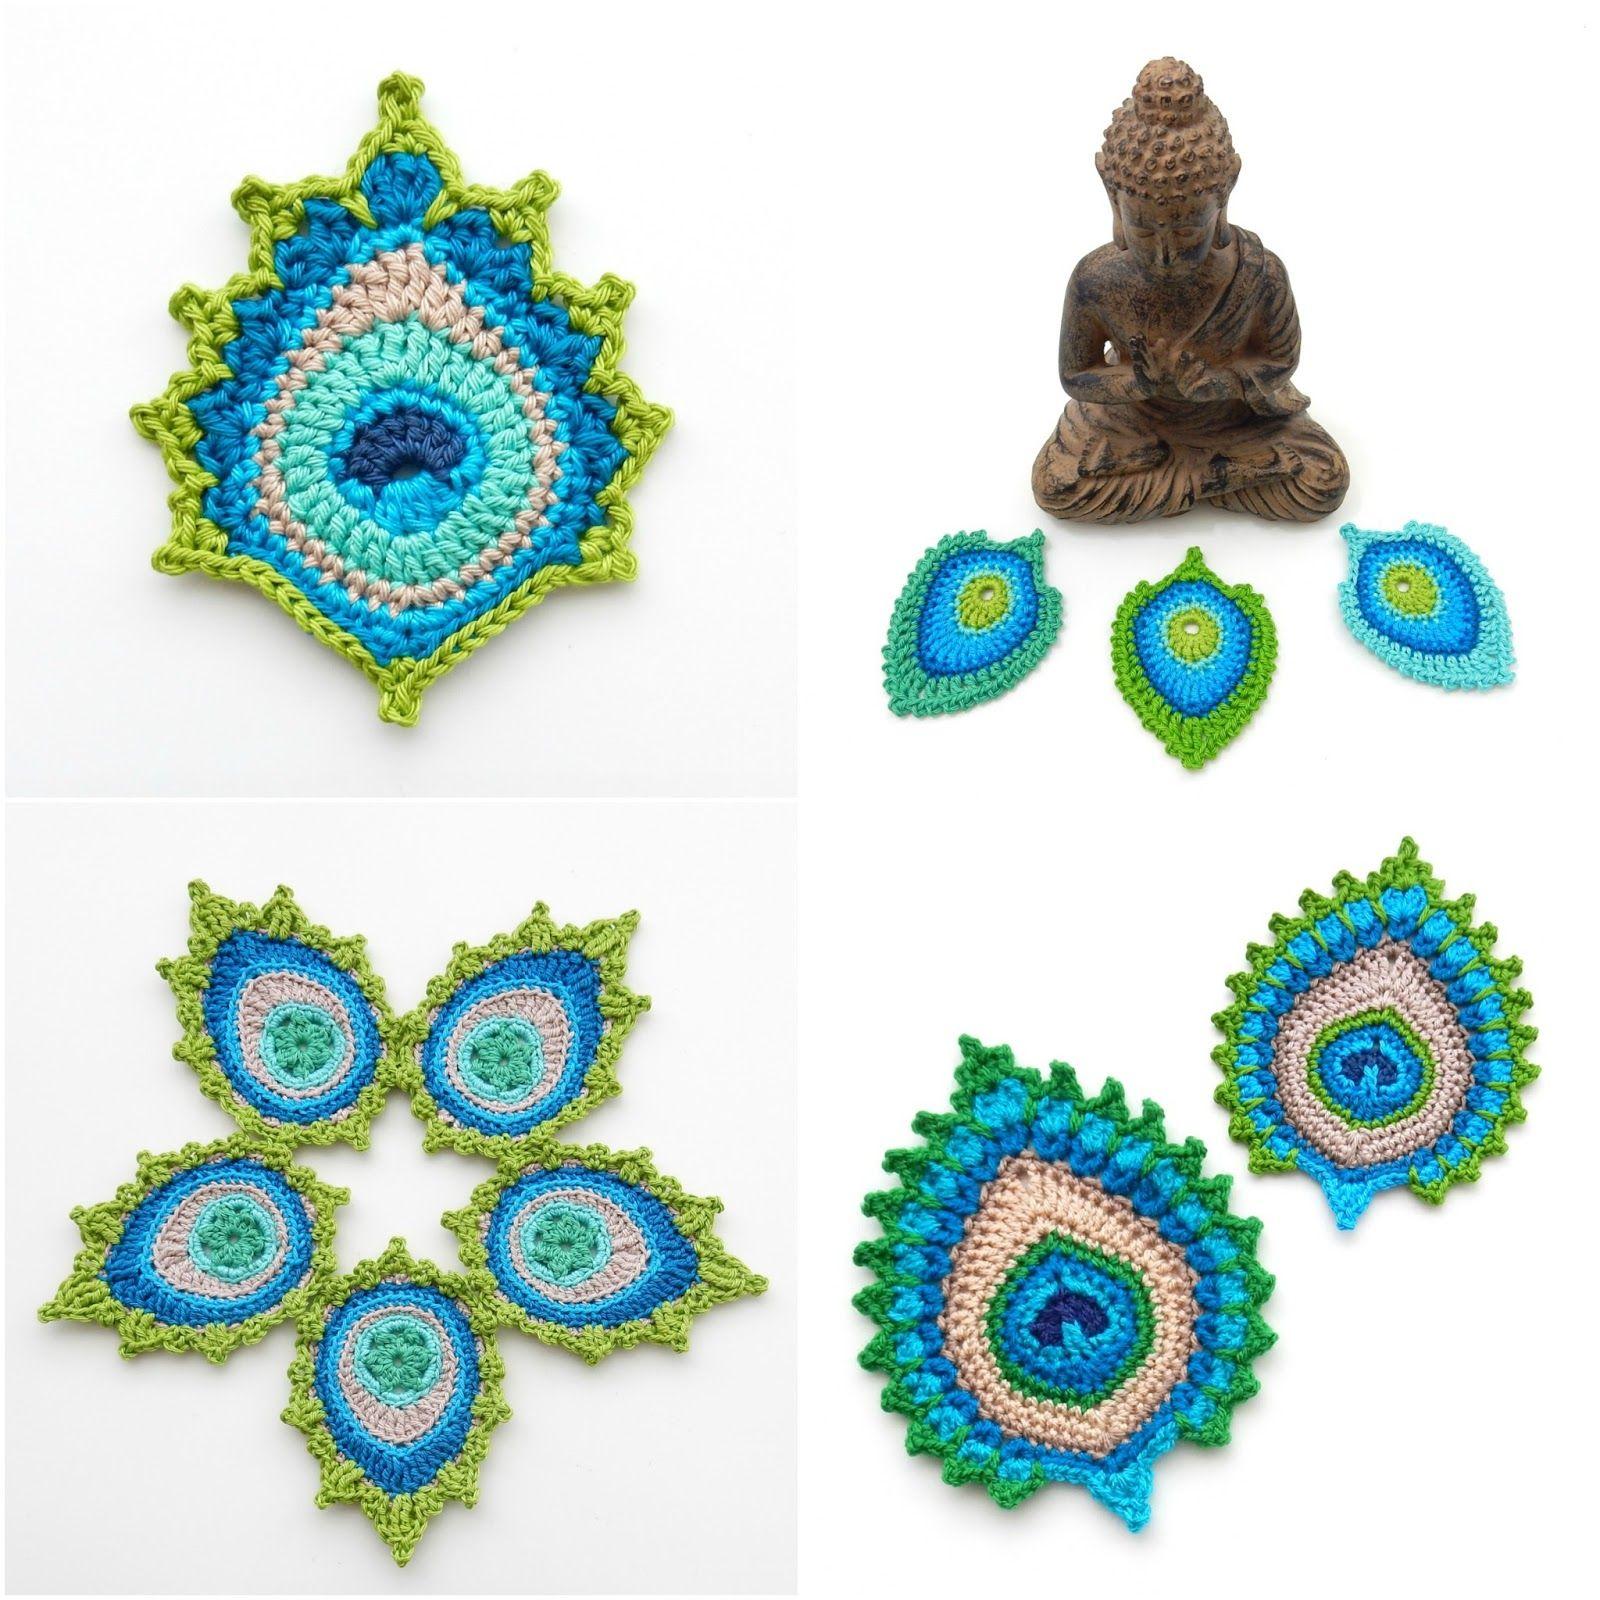 Crochet peacock feather designs by TheCurioCraftsRoom | creative ...